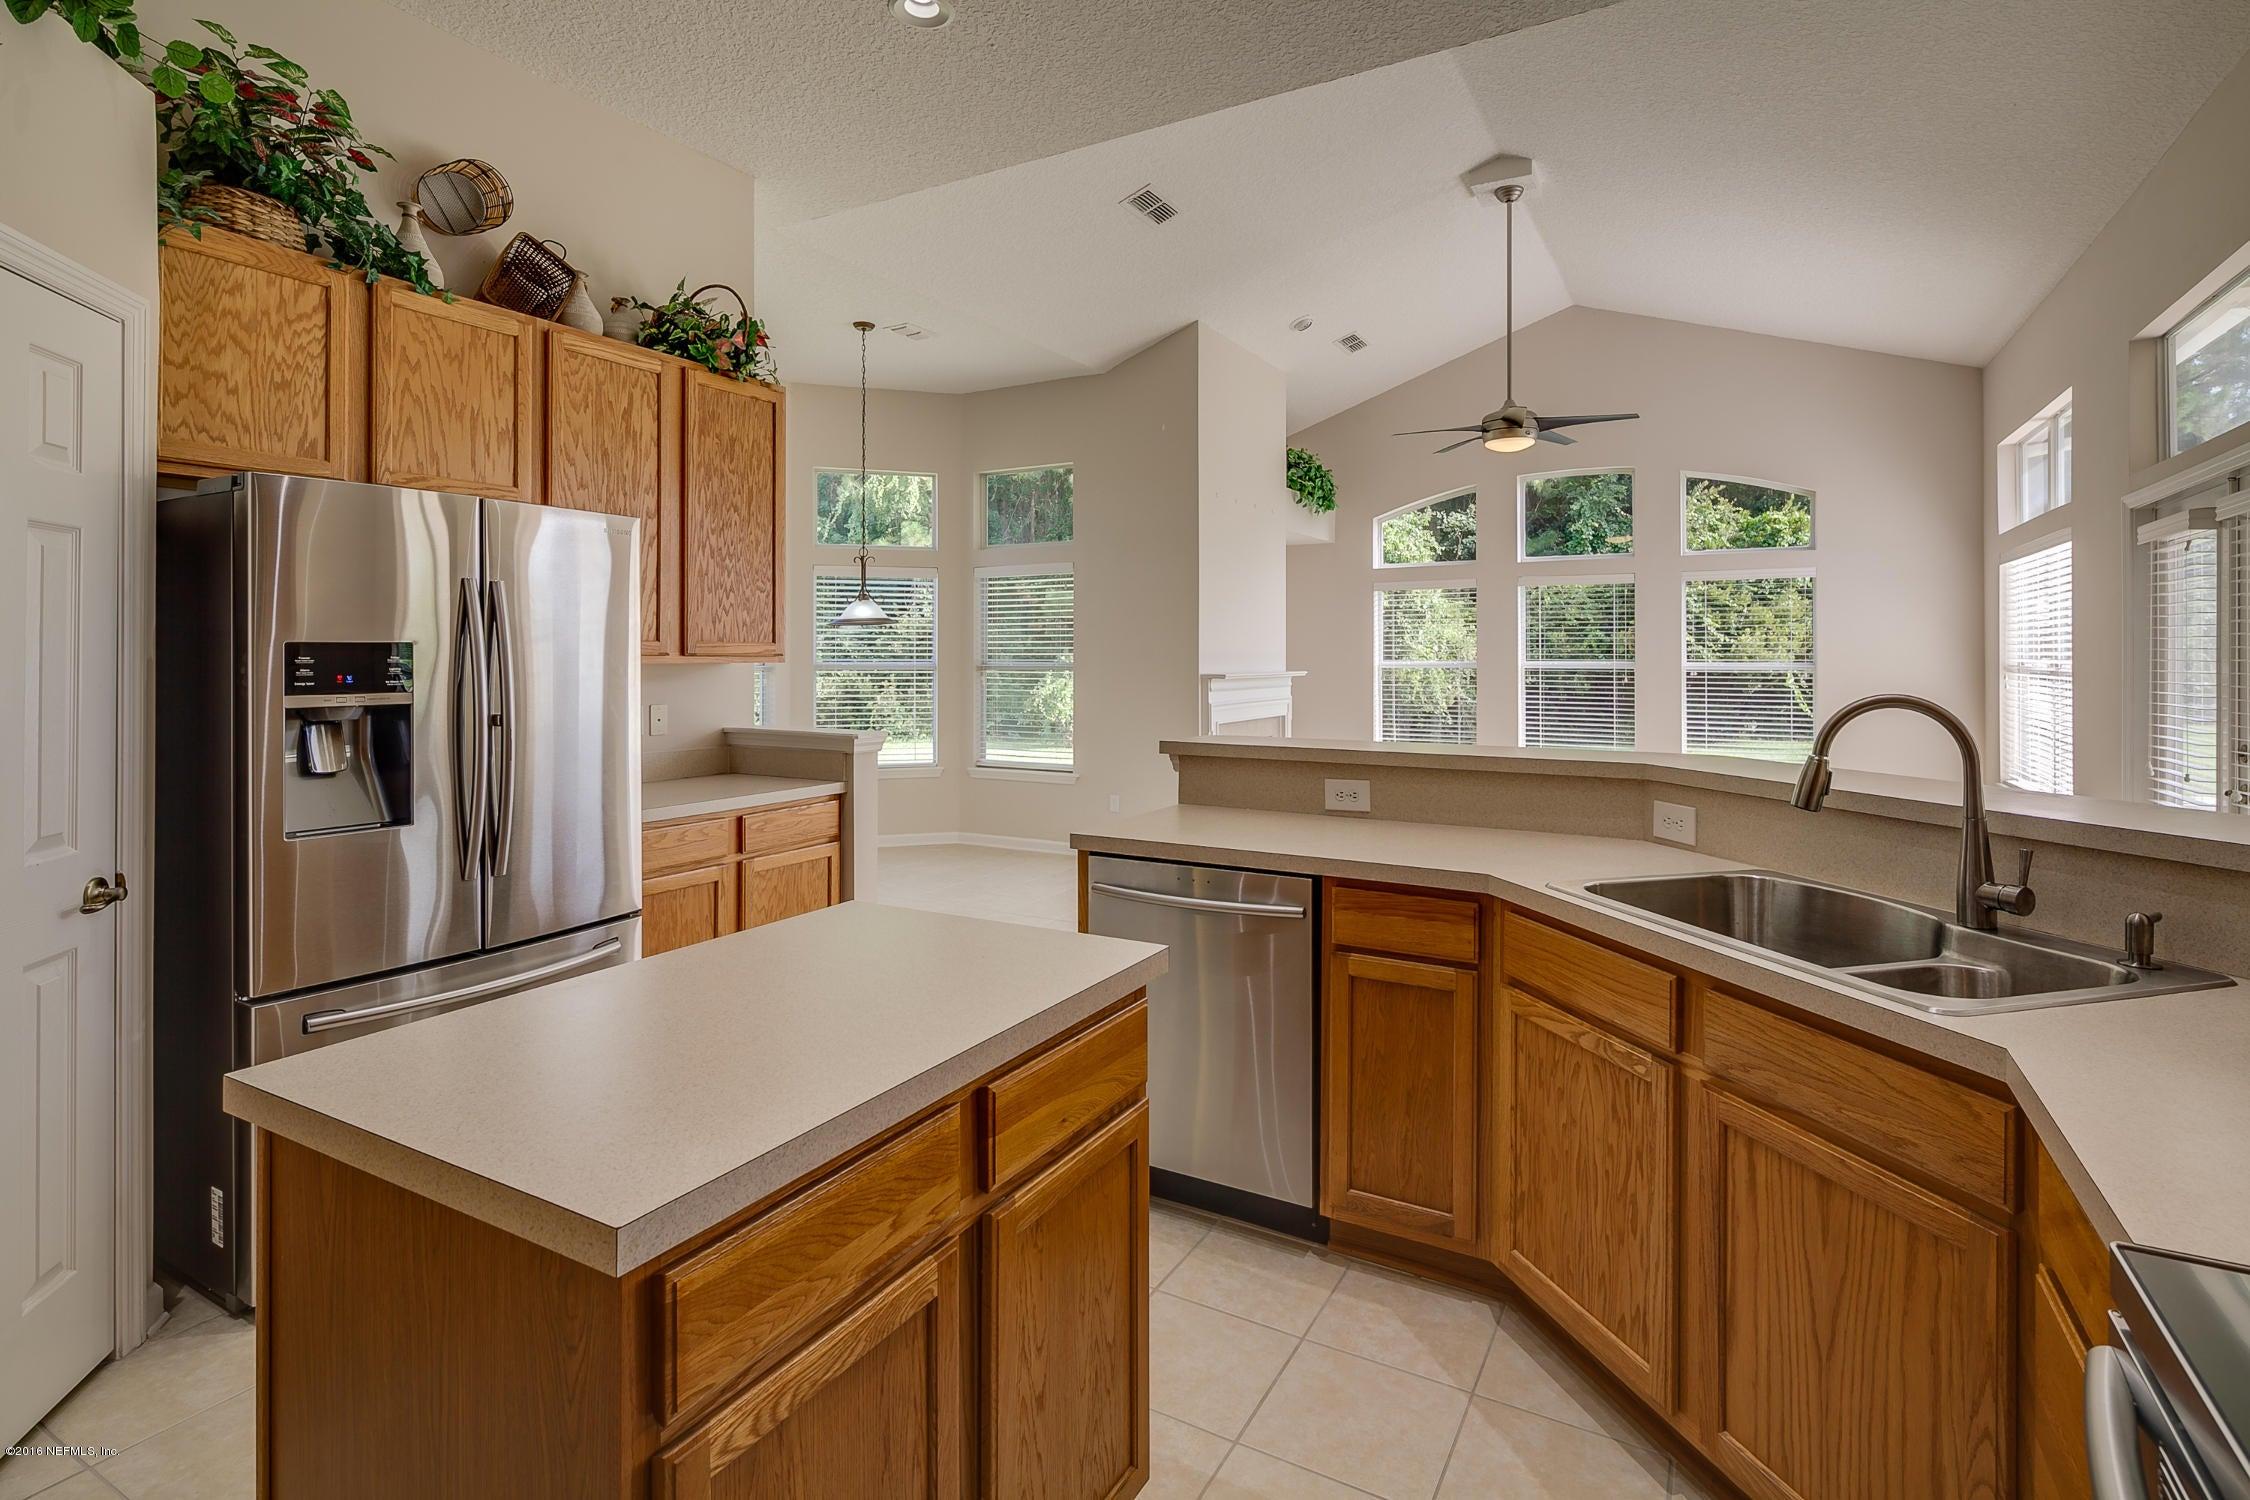 2991 PRESERVE LANDING,JACKSONVILLE,FLORIDA 32226,5 Bedrooms Bedrooms,4 BathroomsBathrooms,Residential - single family,PRESERVE LANDING,834706